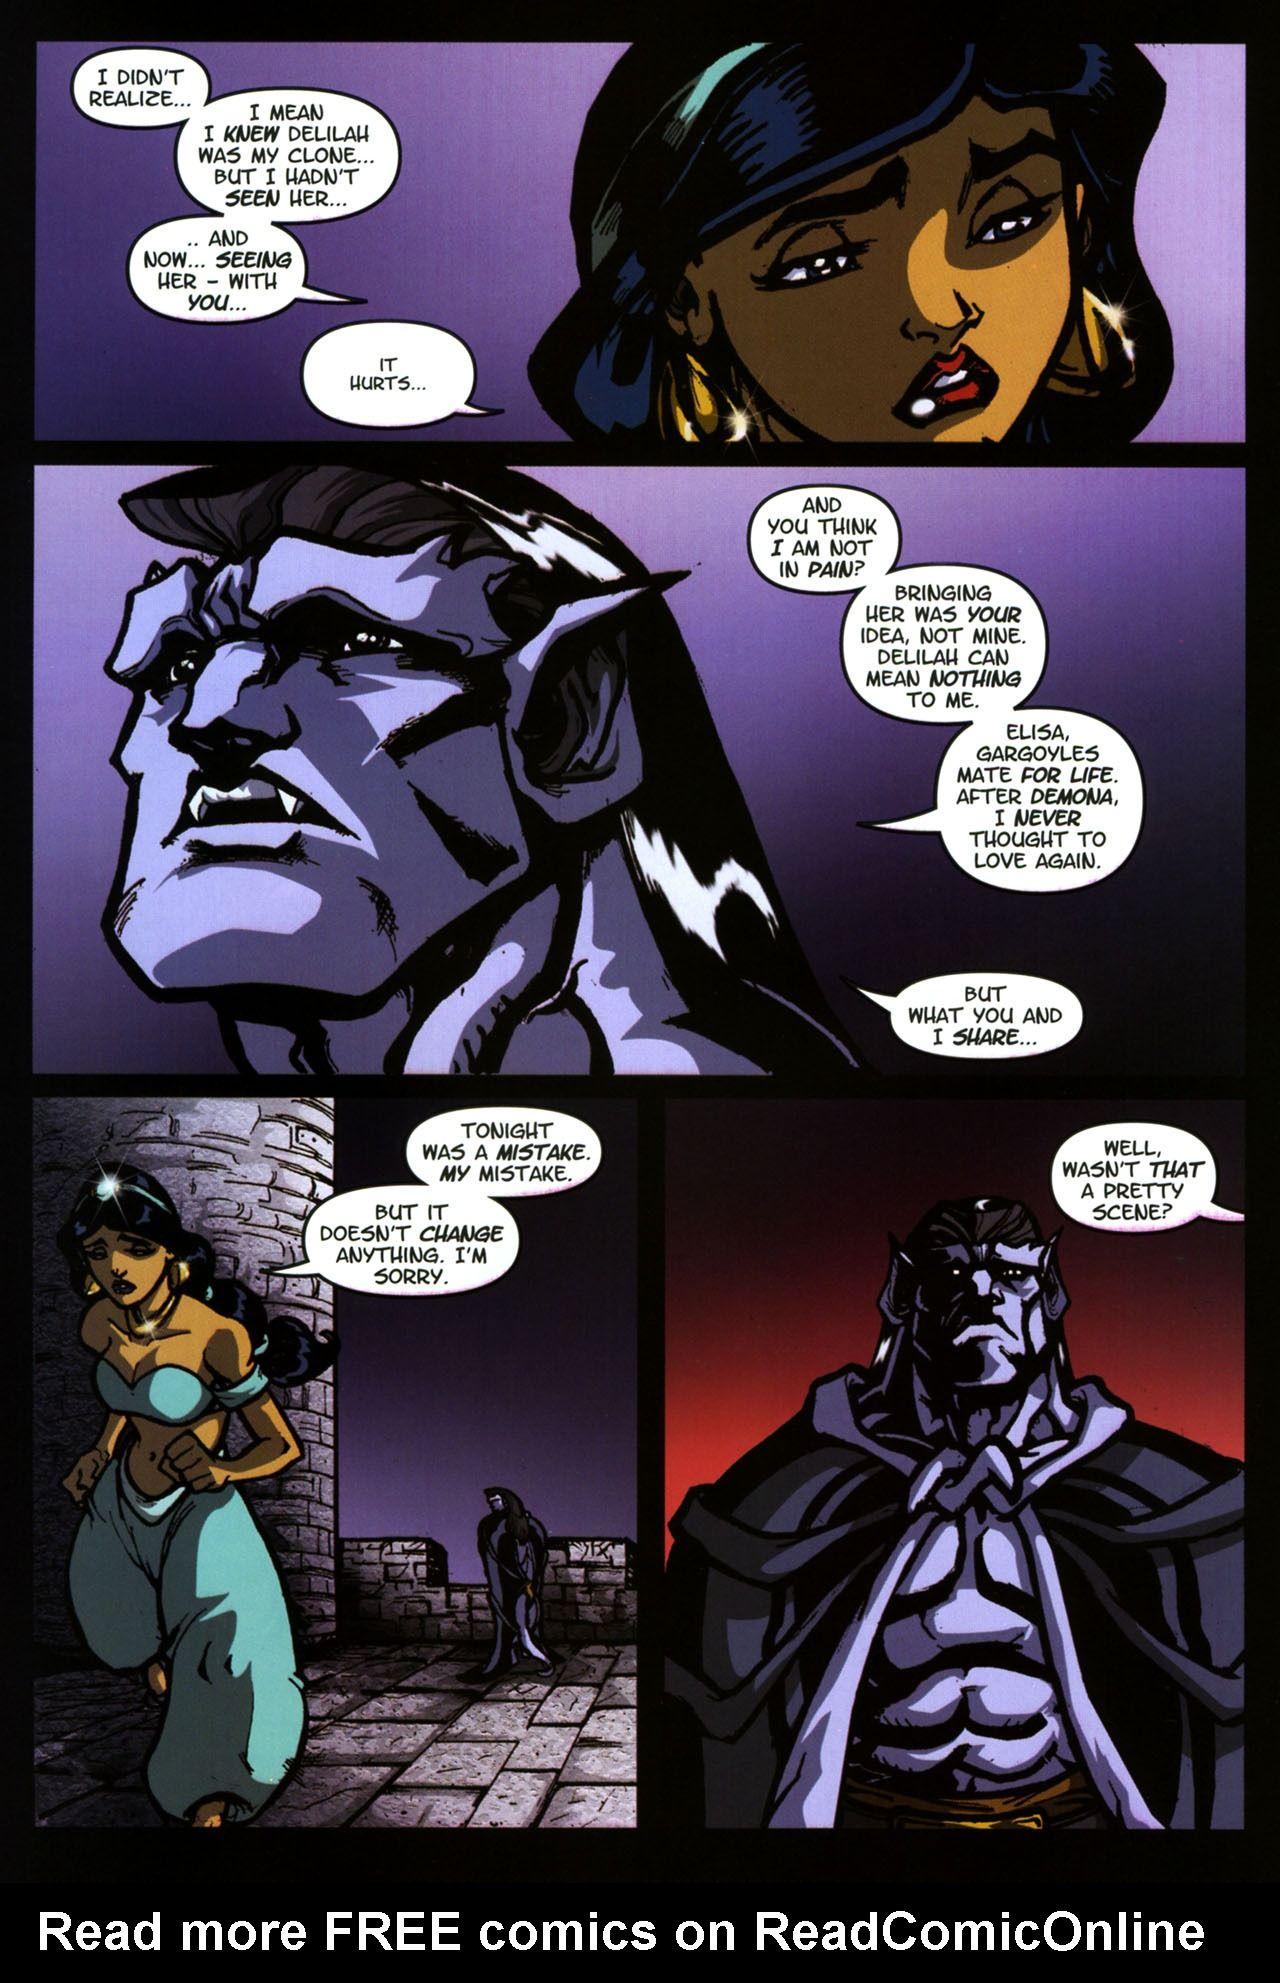 Gargoyles (2006) Issue #4 - Read Gargoyles (2006) Issue #4